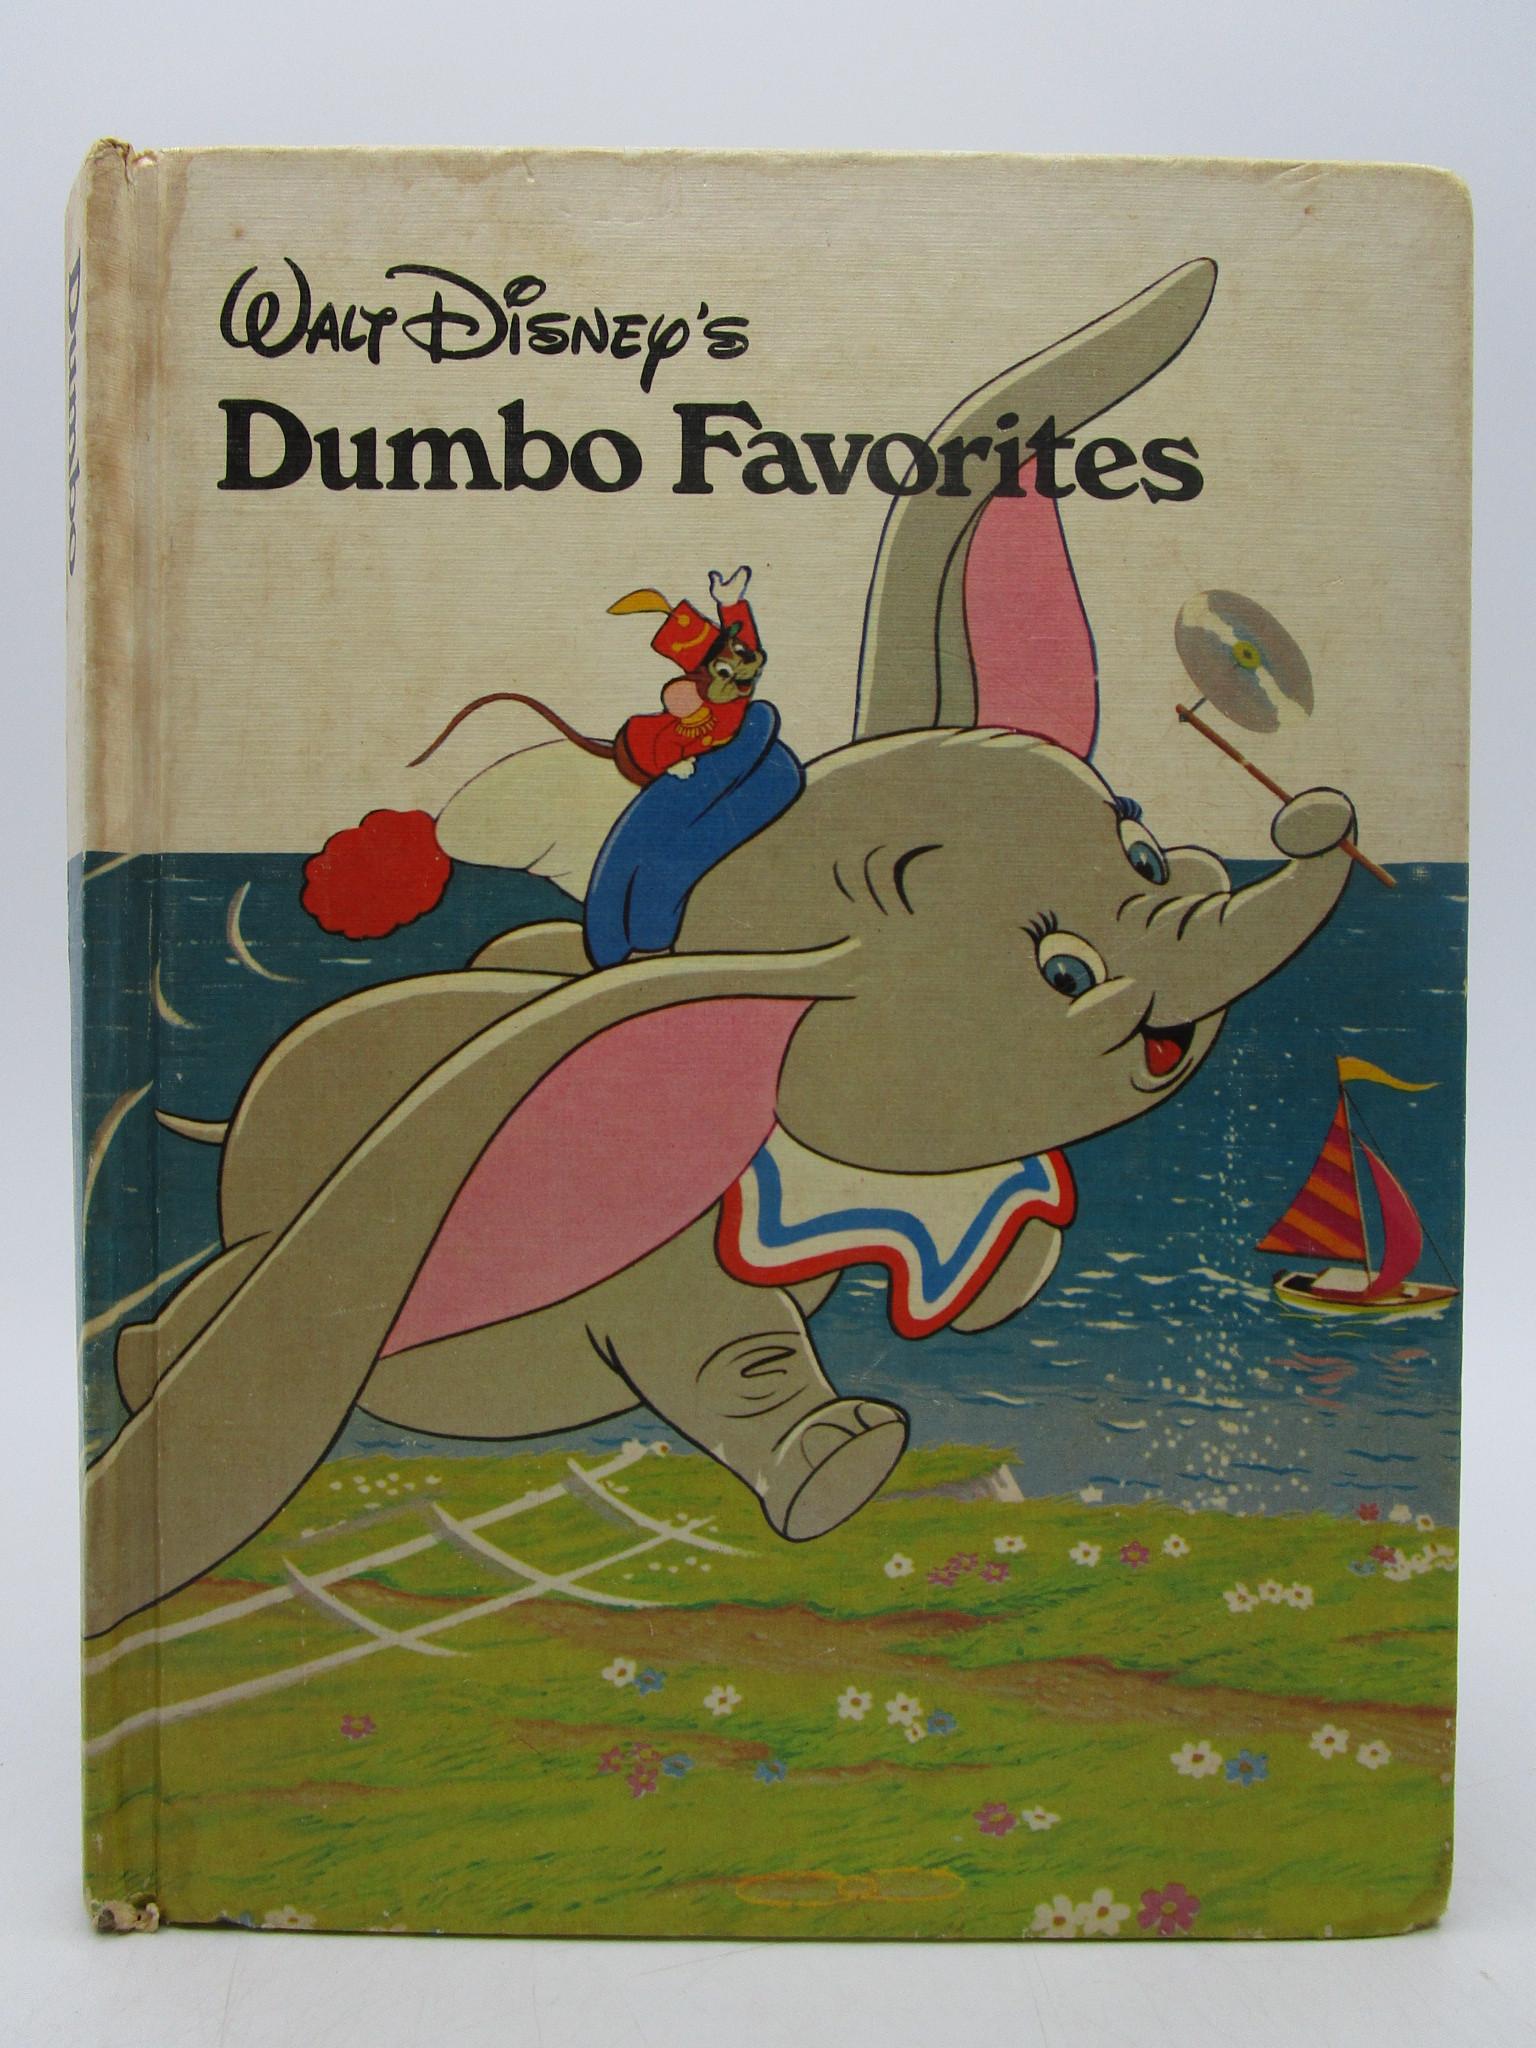 Image for Walt Disney's Dumbo Favorites, Pinocchio Favorites, and Snow White Favorites (3 volumes)